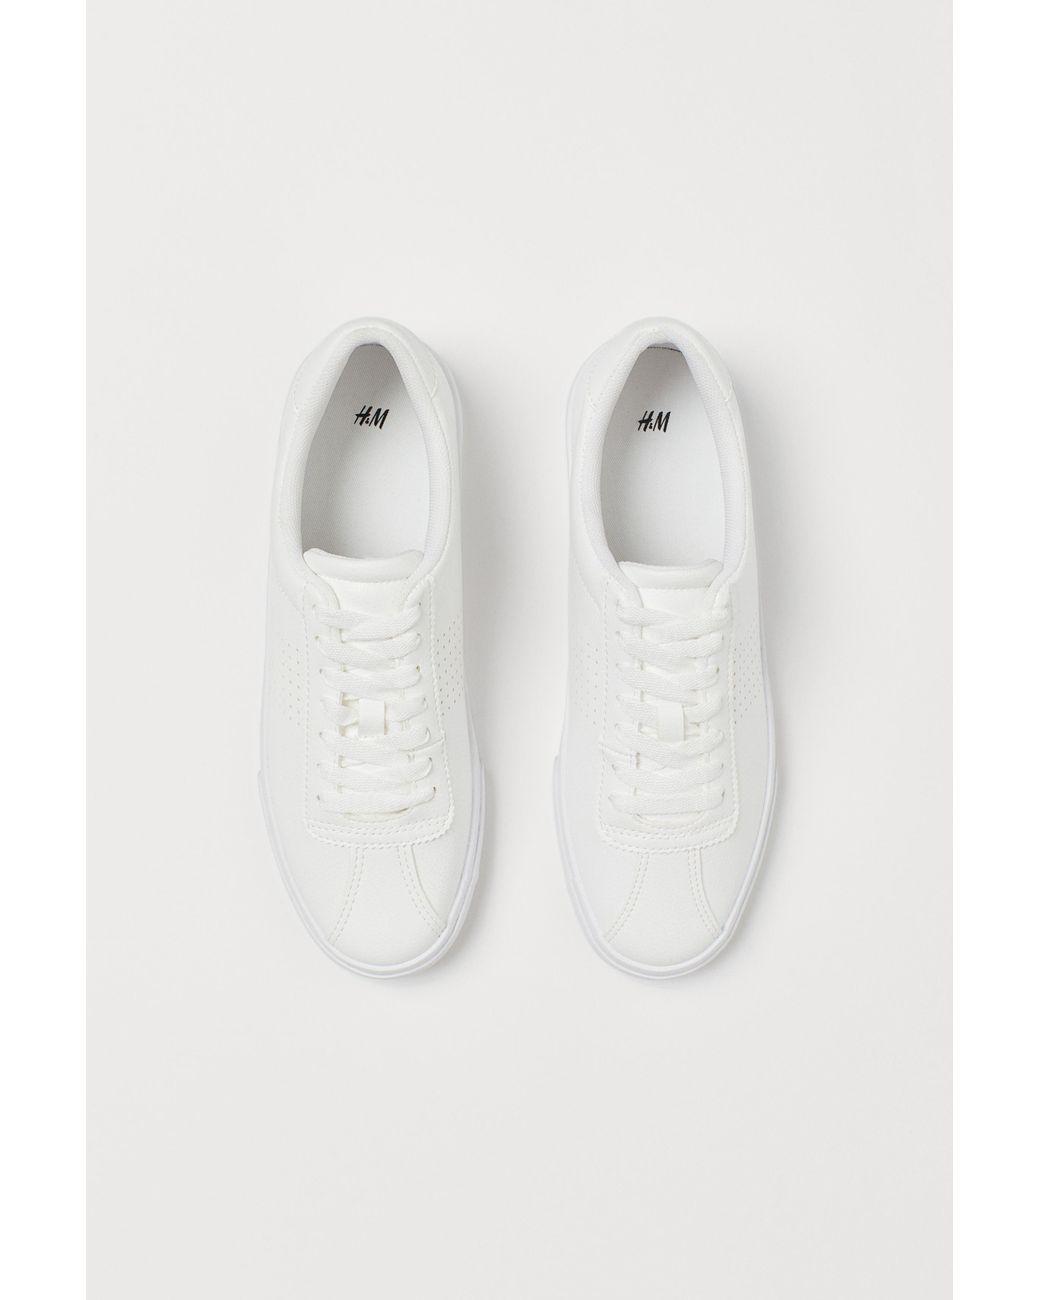 H\u0026M Sneakers in White - Lyst